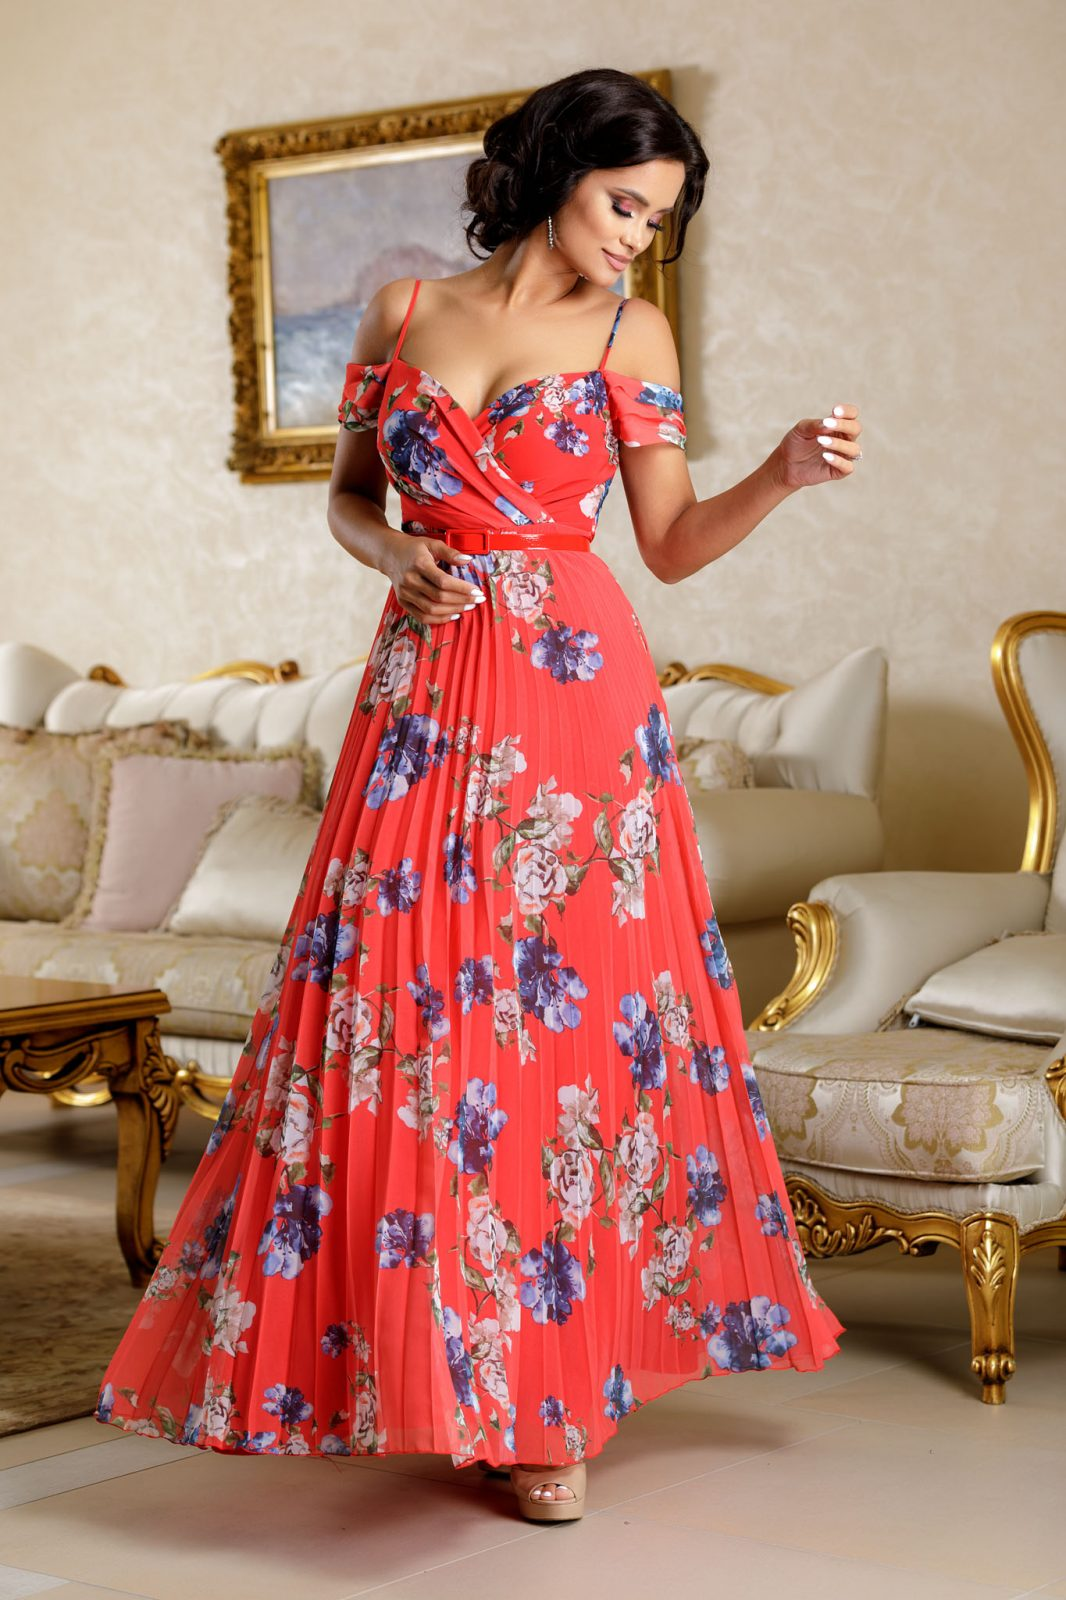 Hellen Red Dress